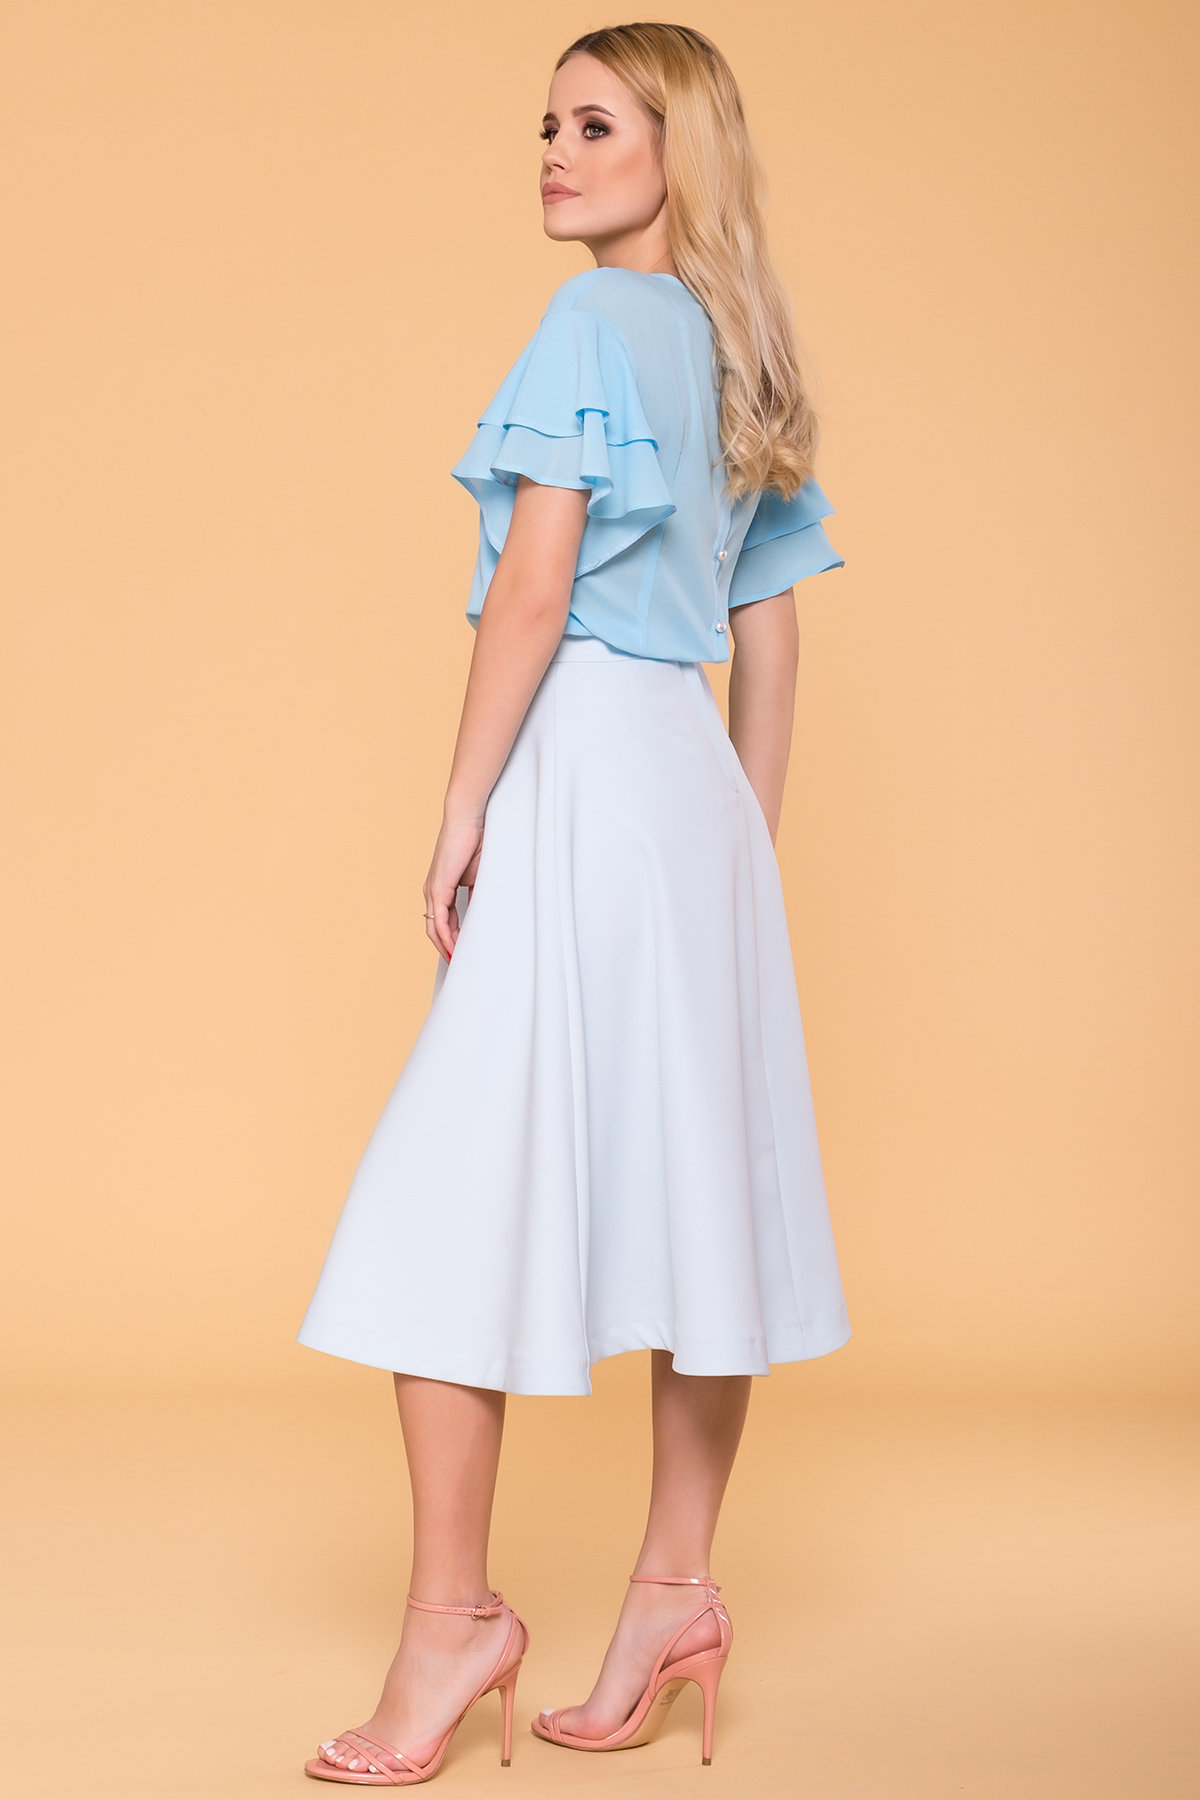 Блуза Мария 4882 АРТ. 34581 Цвет: Голубой - фото 2, интернет магазин tm-modus.ru